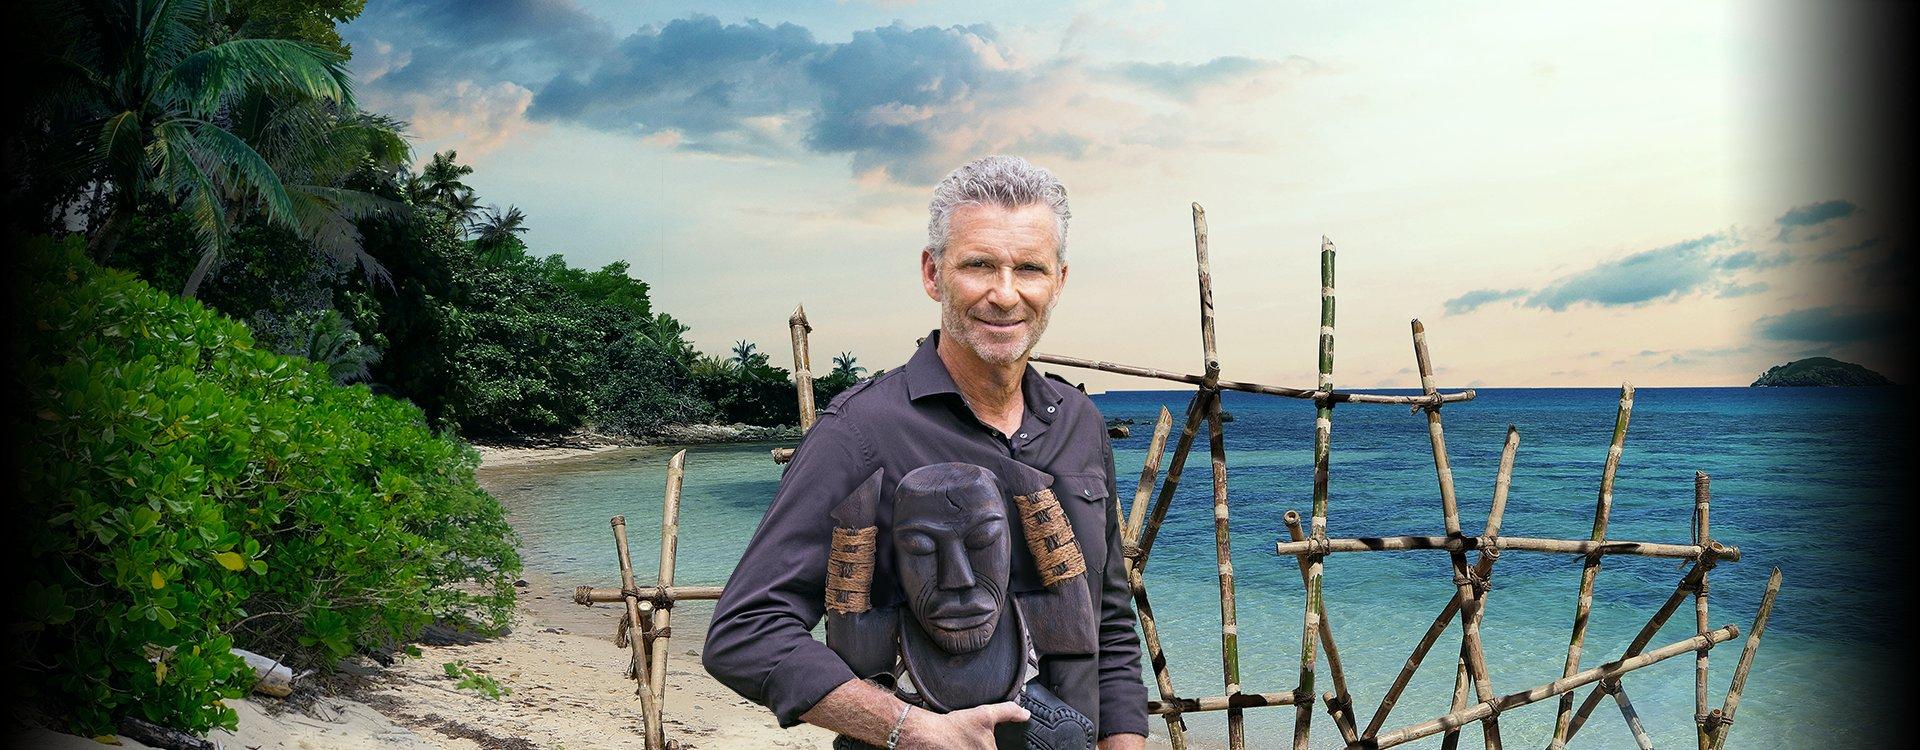 Koh-Lanta - L'île des héros